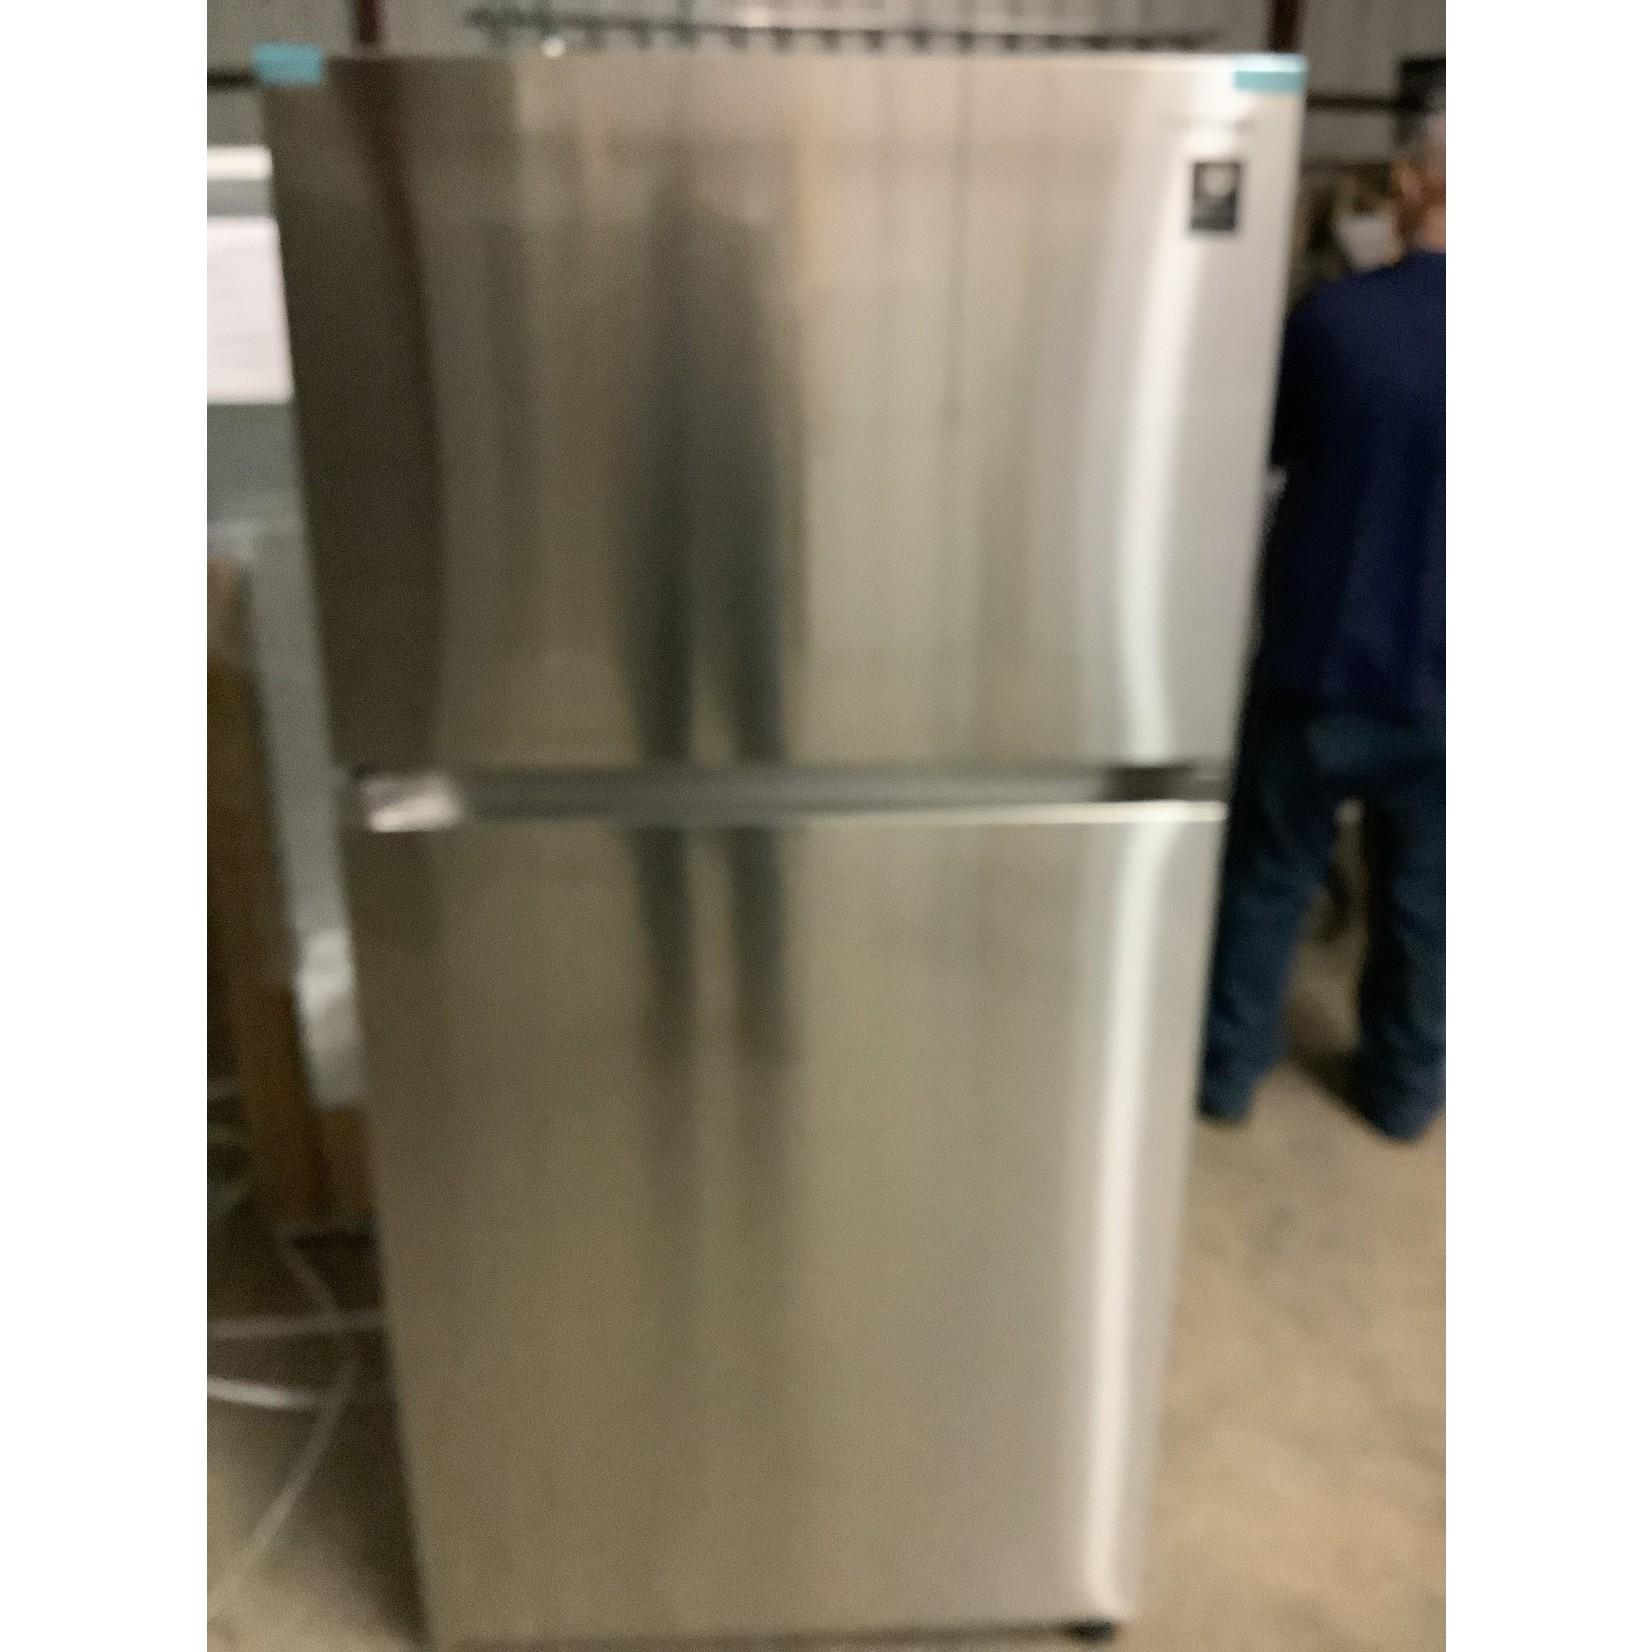 Samsung Samsung refrigerator